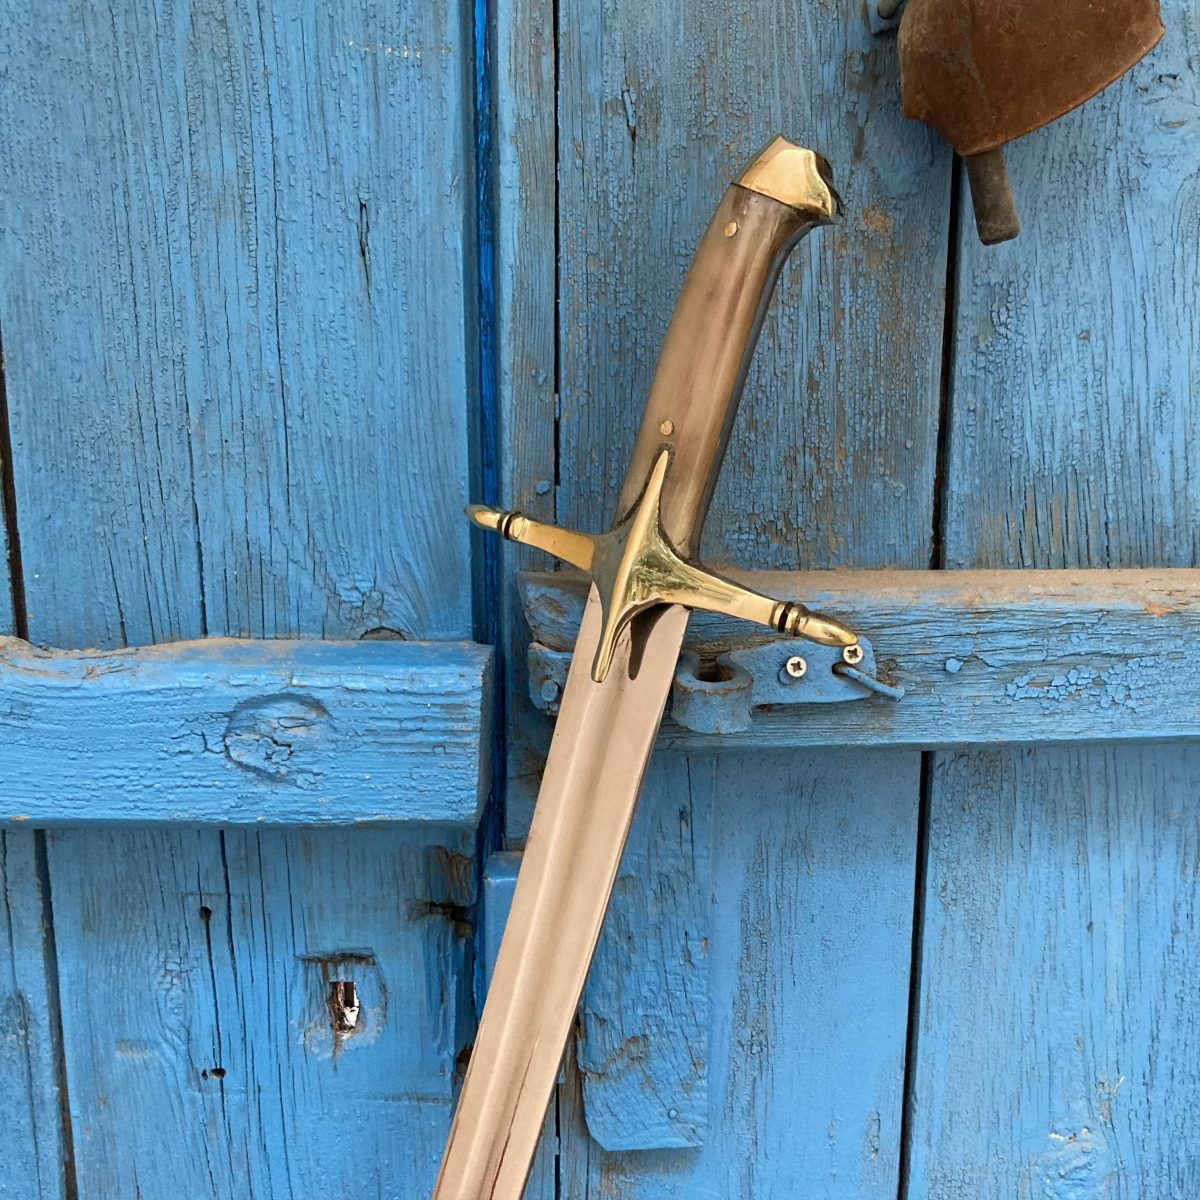 Buy 16 17. Century Ottoman Curved Fuller Horn Handle Sword 5 scaled 16-17. Century Ottoman Curved Fuller Horn Handle Sword